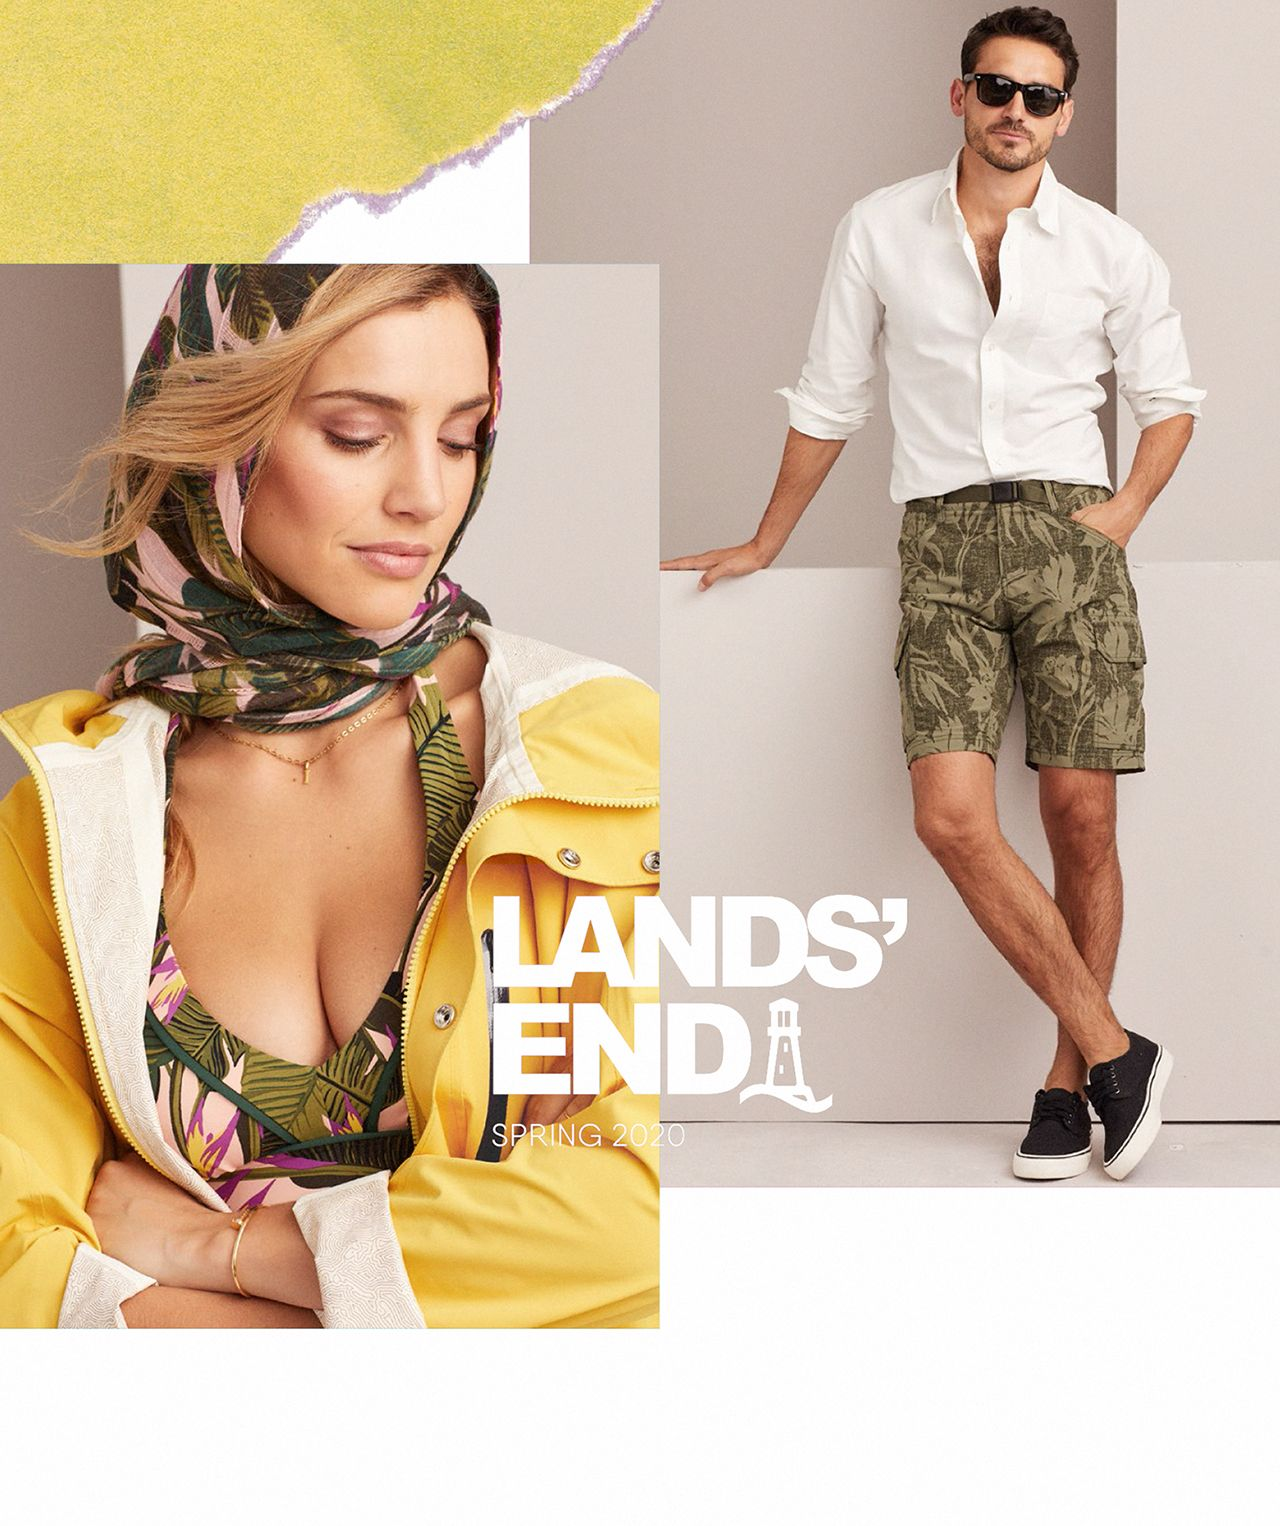 Lands End Spring Look-book 2020